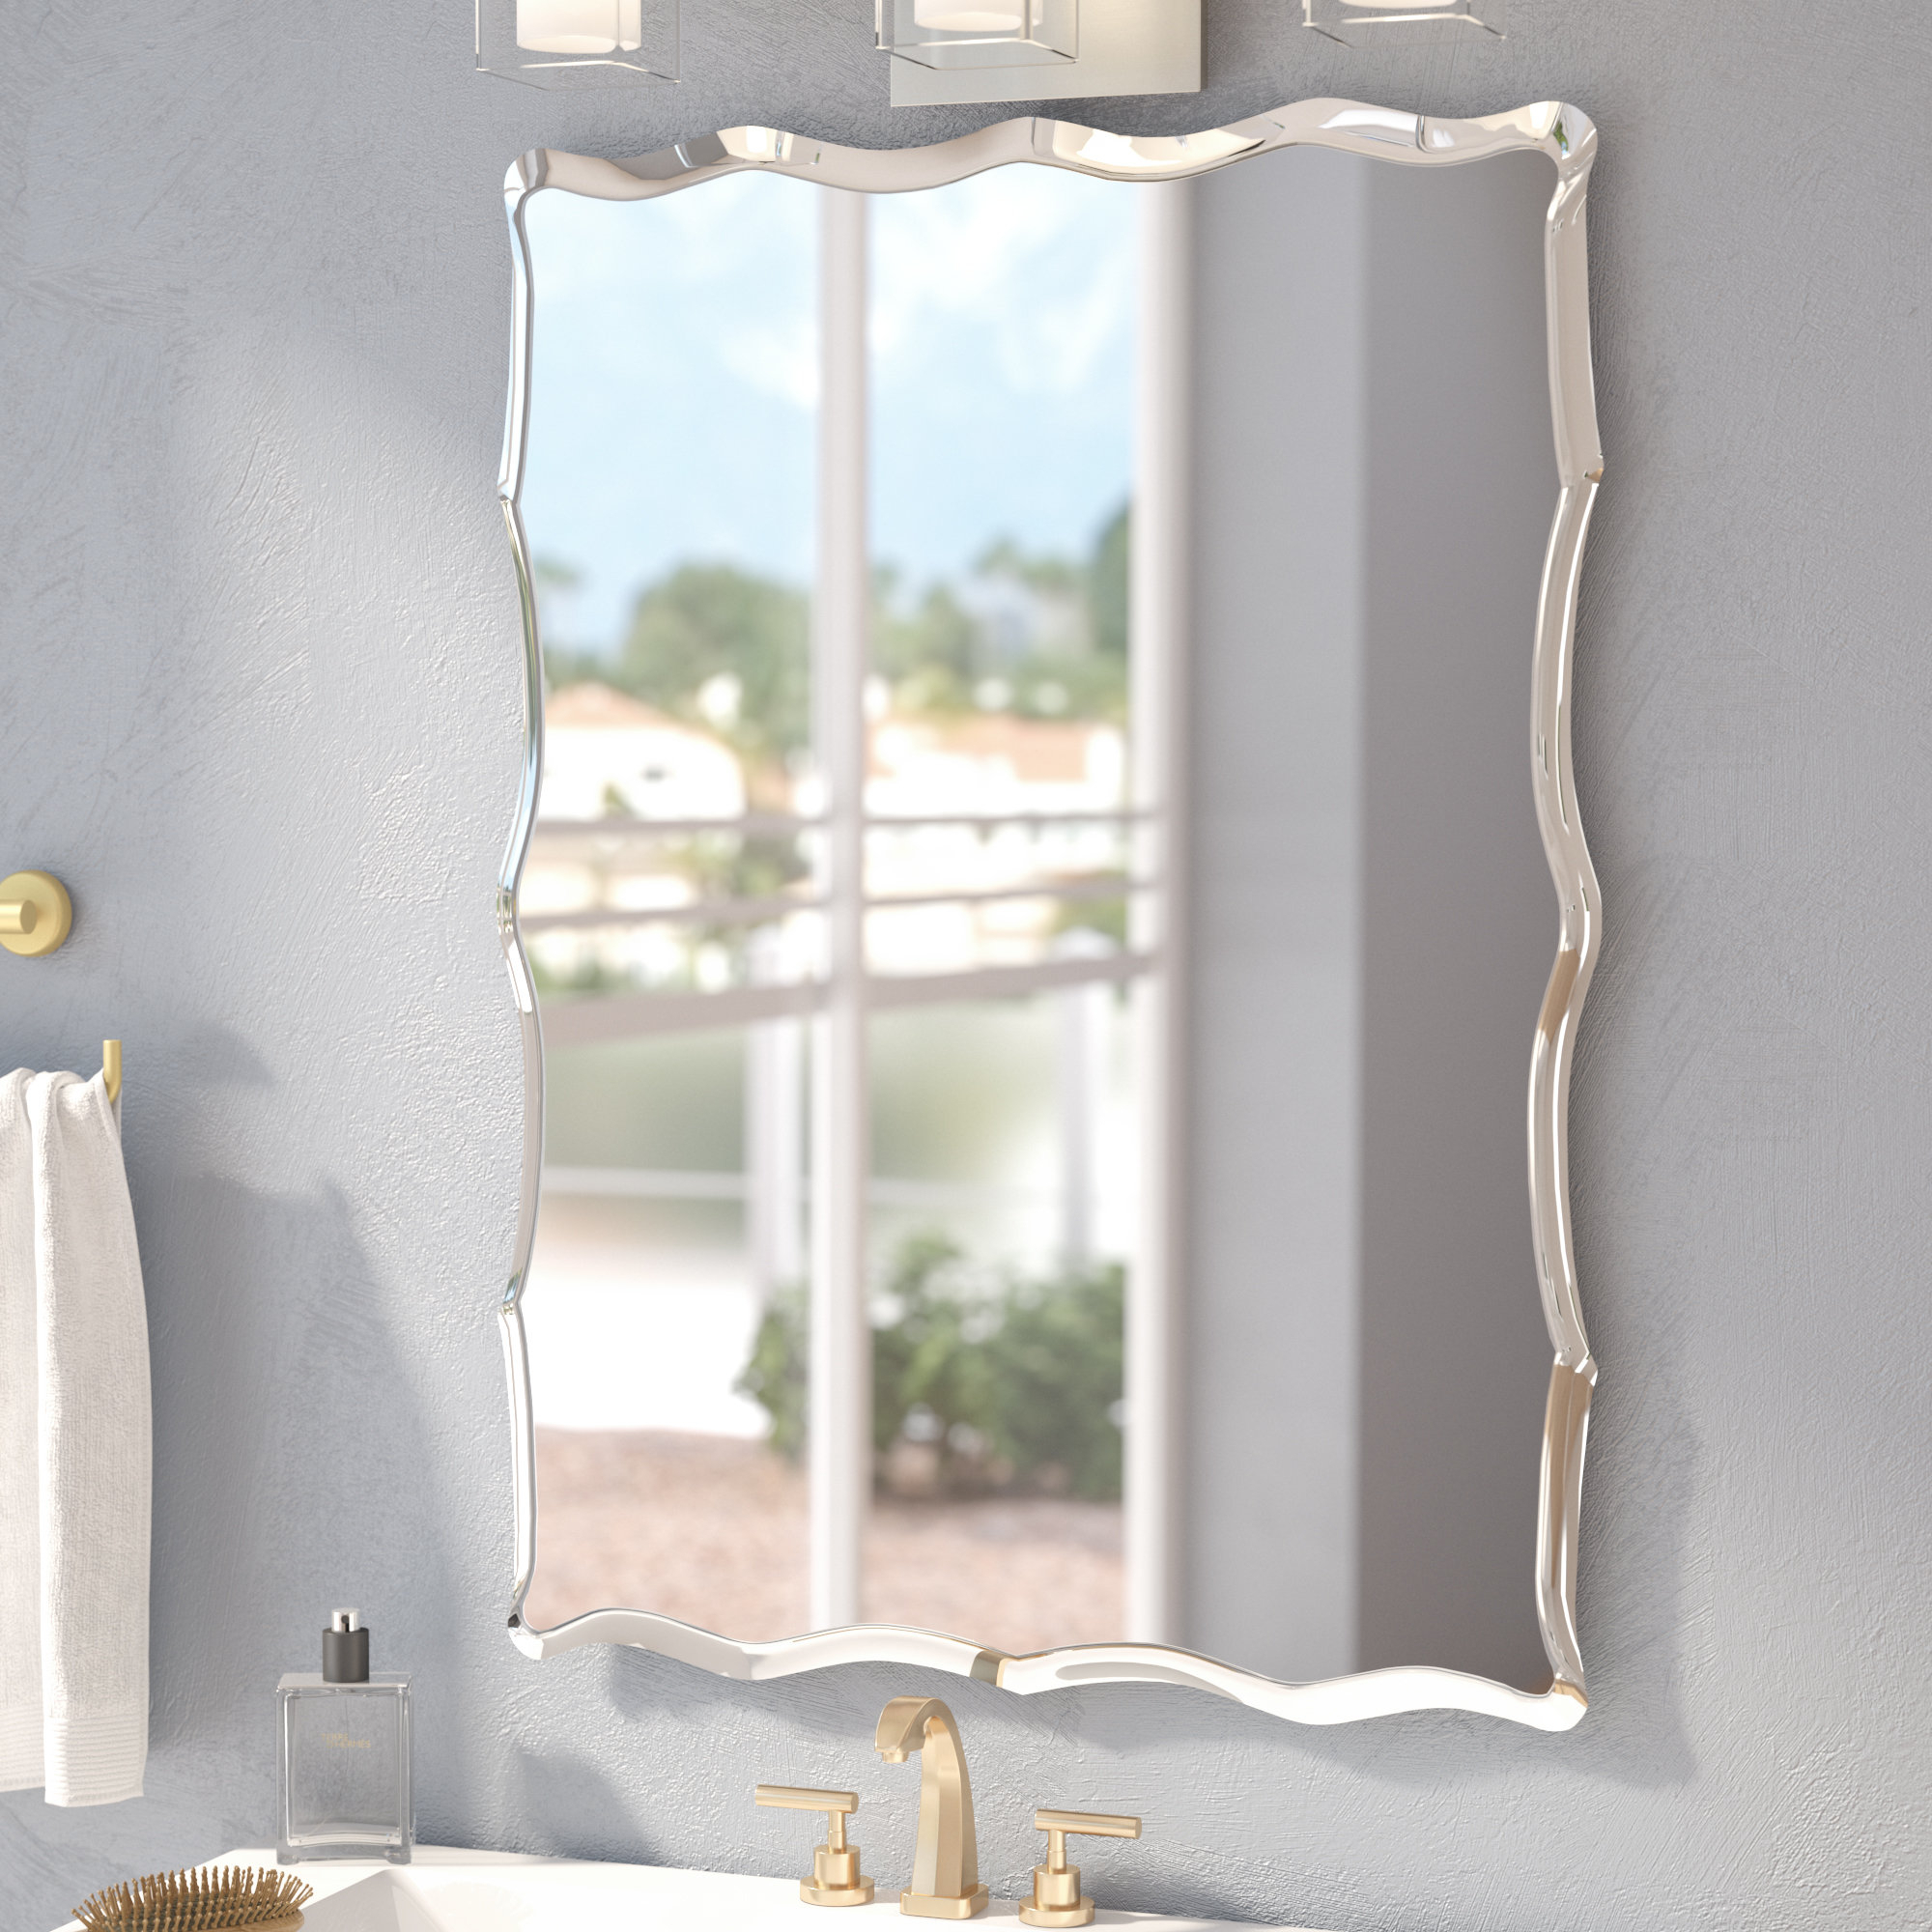 Wade Logan Estefania Frameless Wall Mirror & Reviews | Wayfair For Estefania Frameless Wall Mirrors (View 2 of 20)